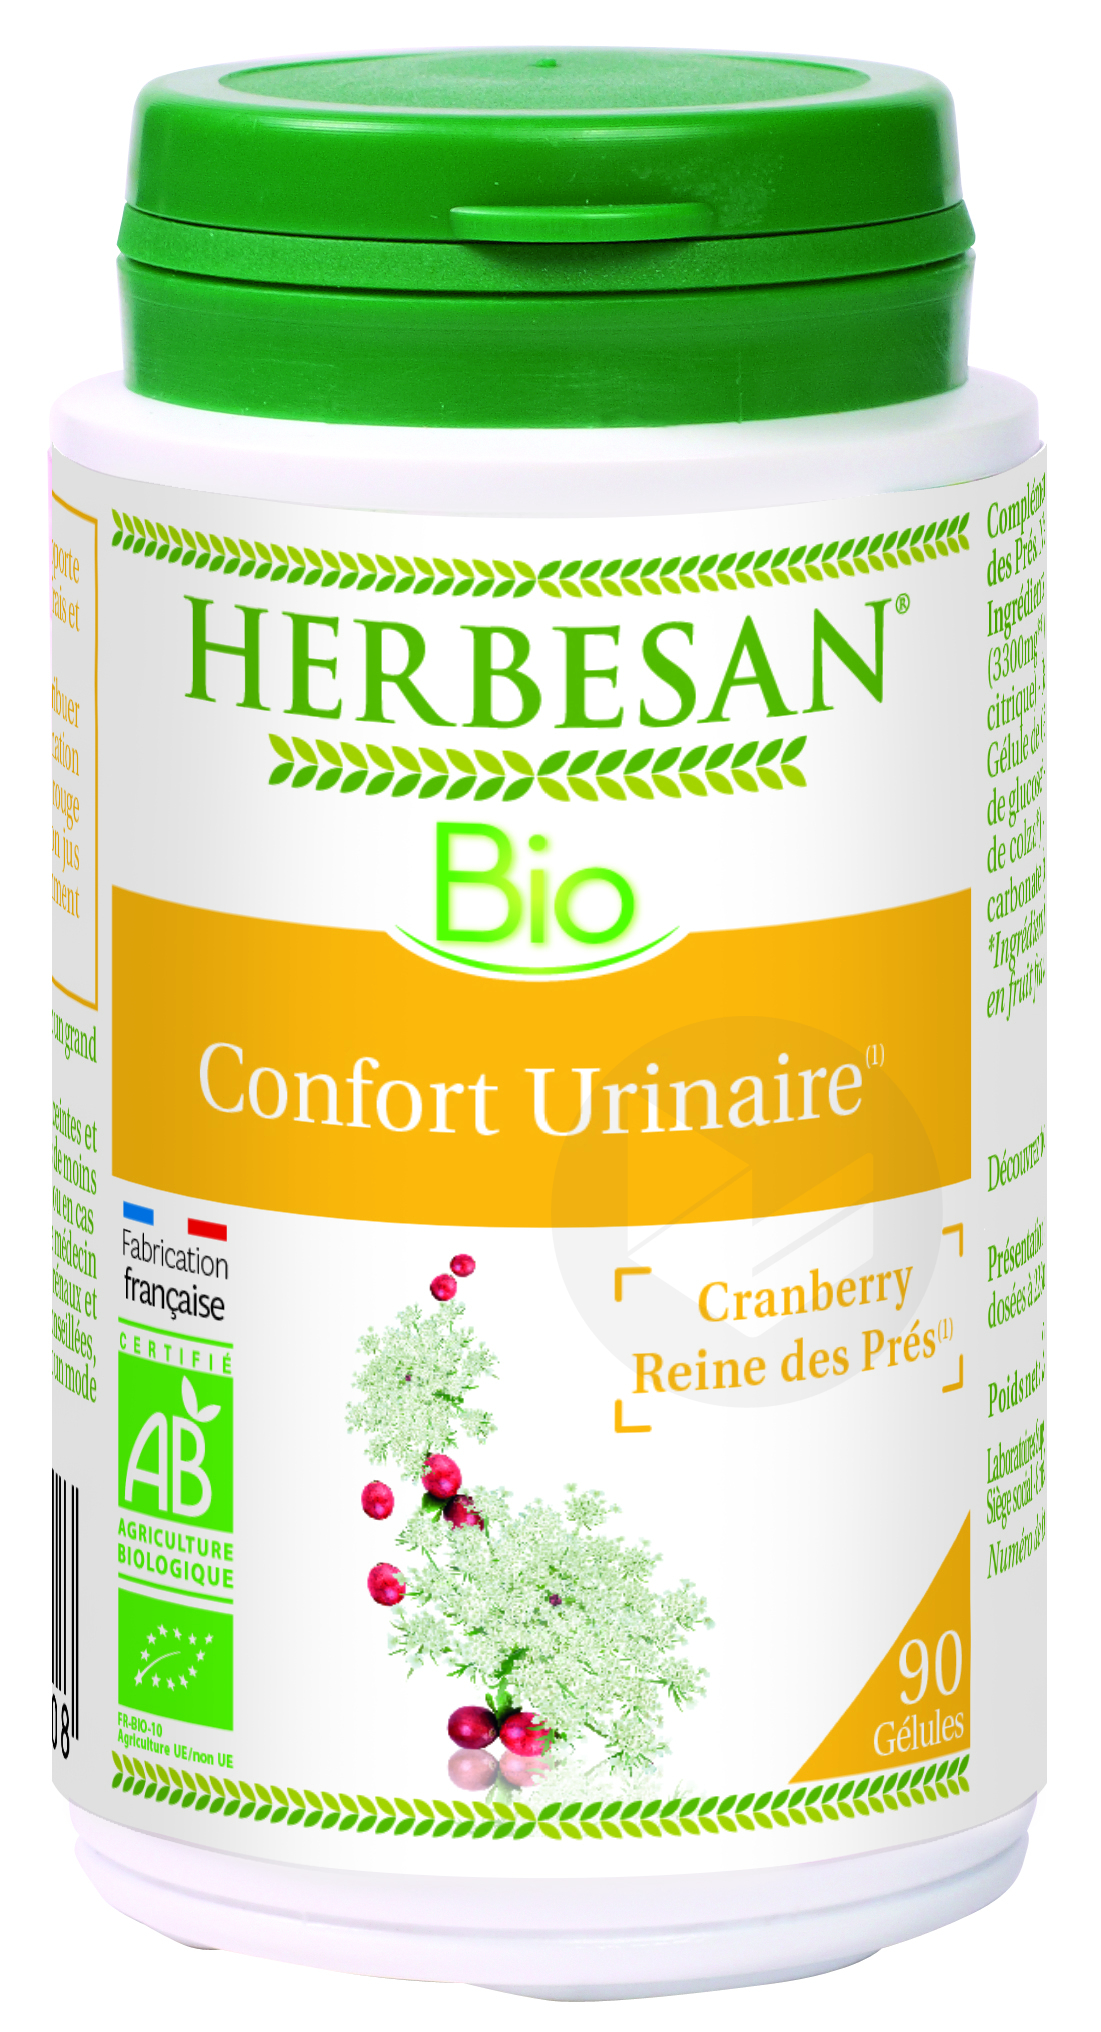 Cranberry Reine Des Pres Bio 90 Gelules